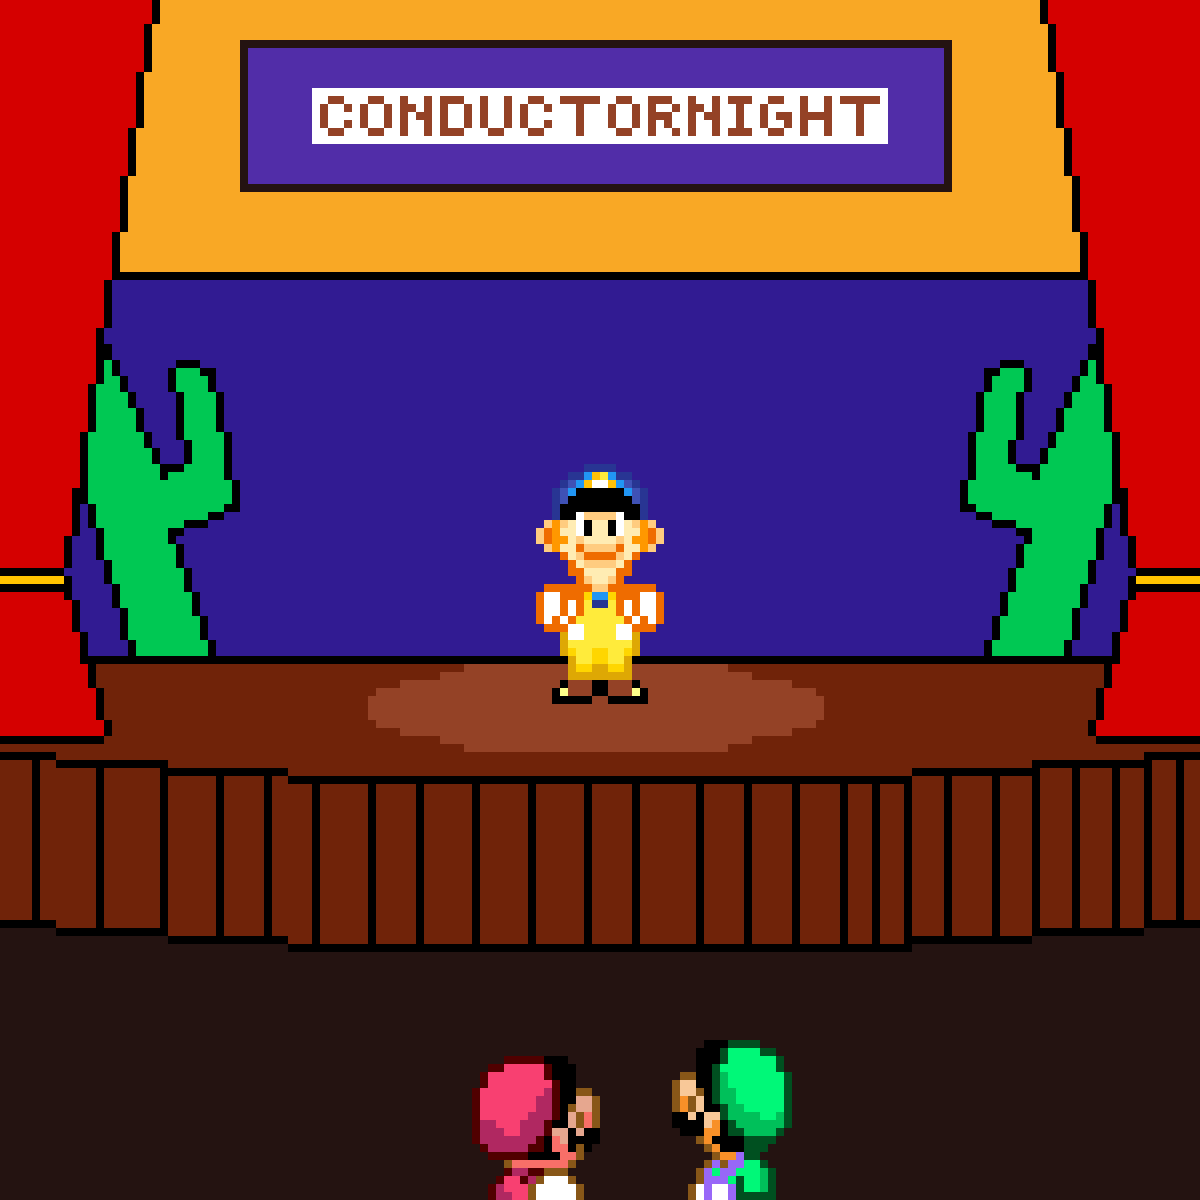 main-image-ConductorNight - Battle of Award 64  by UNDERNightPlumb